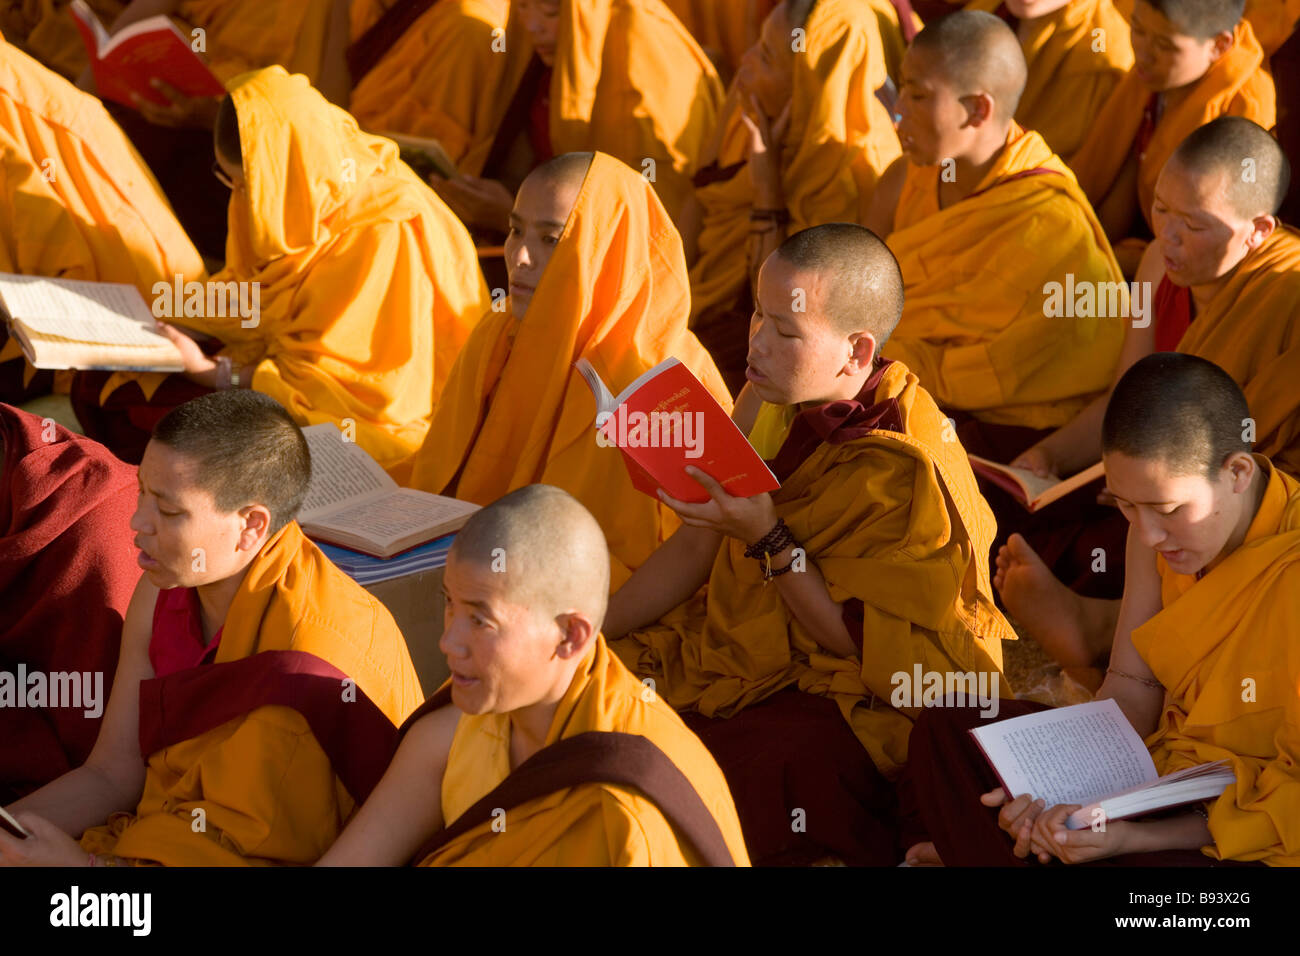 Monks attending buddhist teachings Bodh Gaya, nr Gaya, Bihar, India - Stock Image